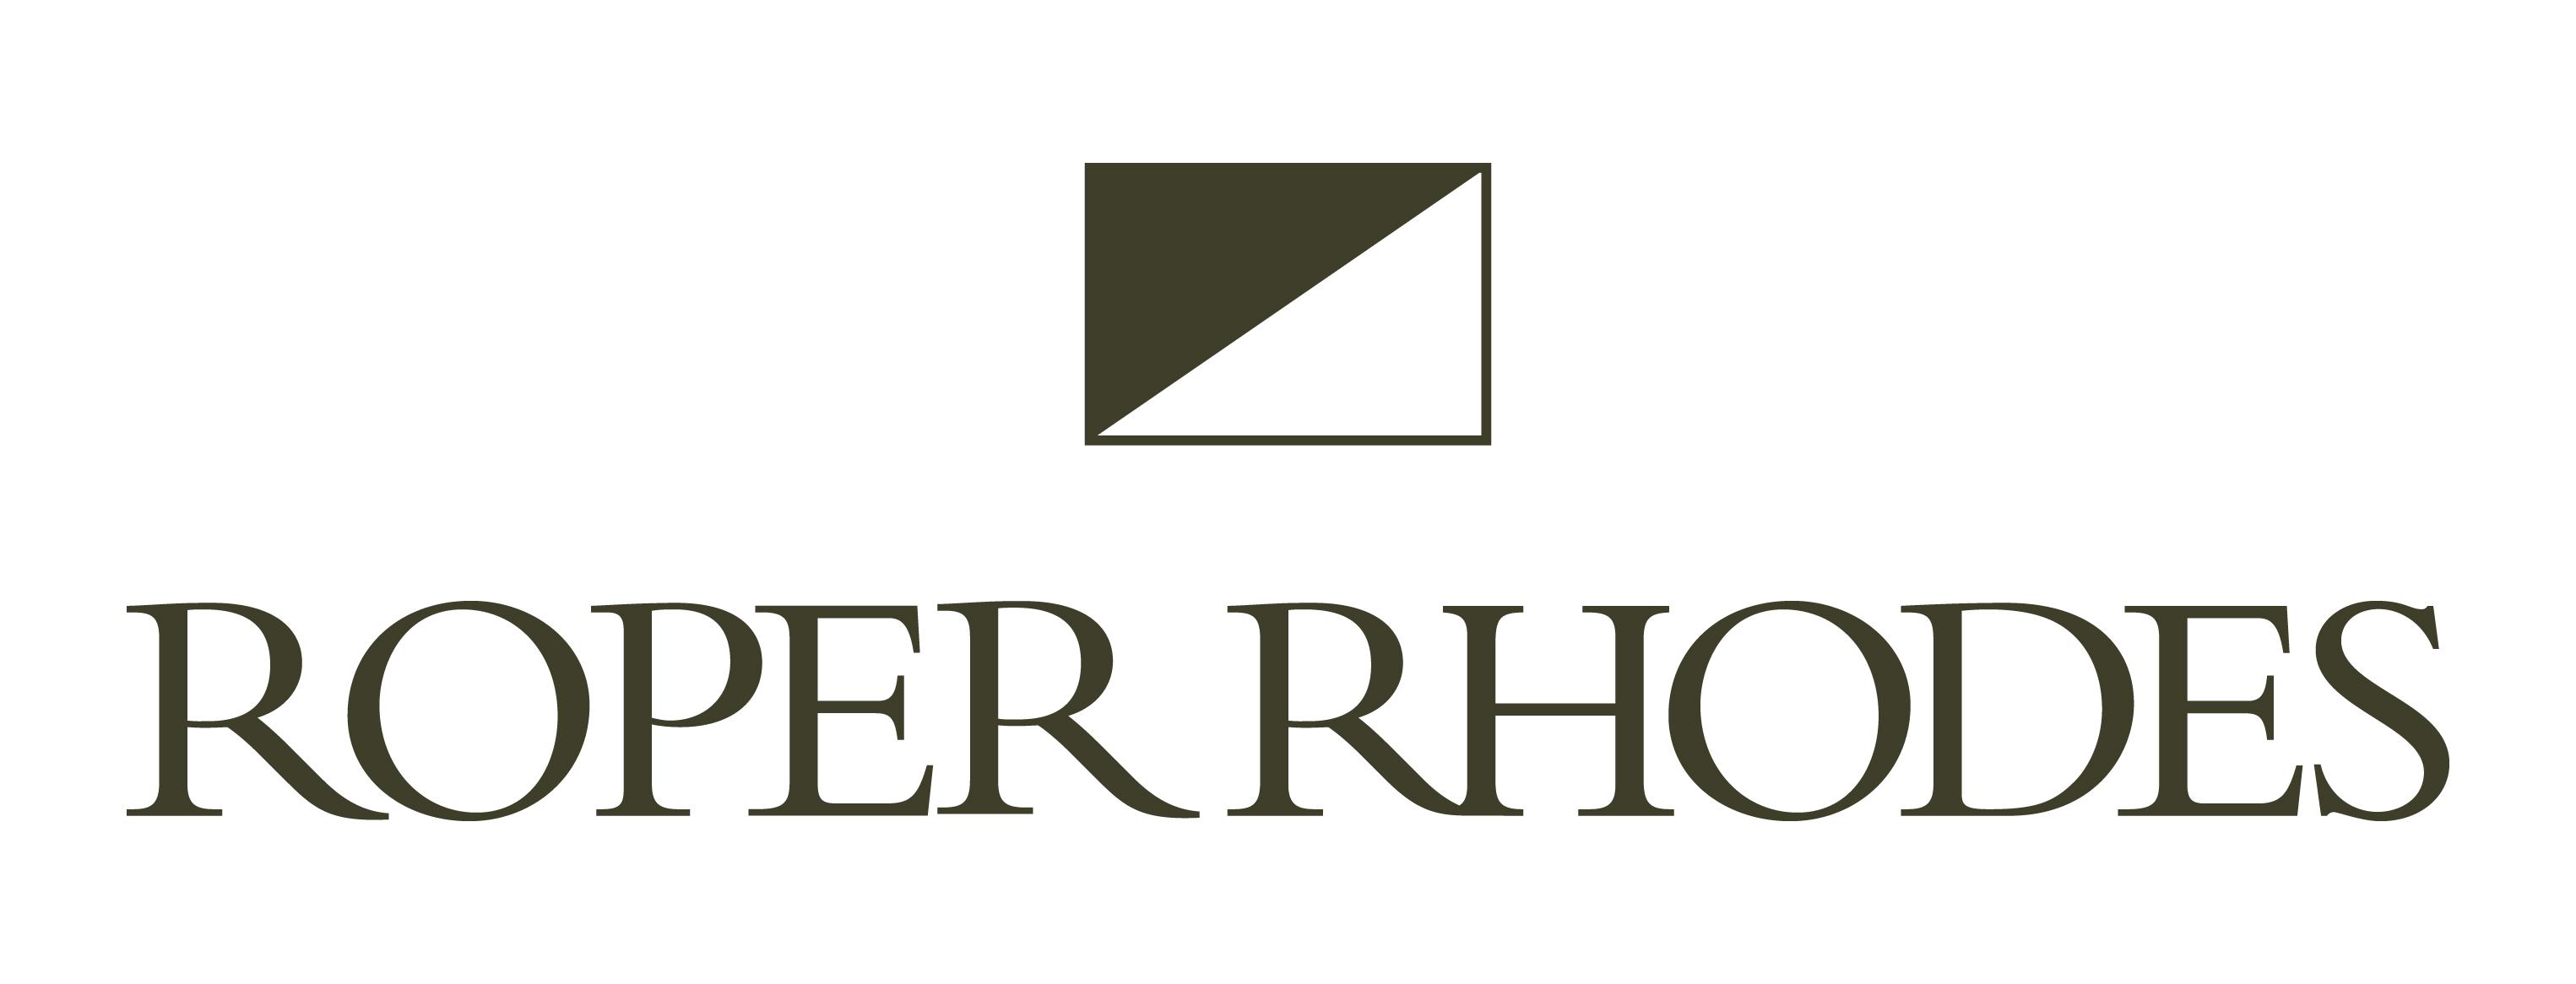 Ropper Rhodes logo